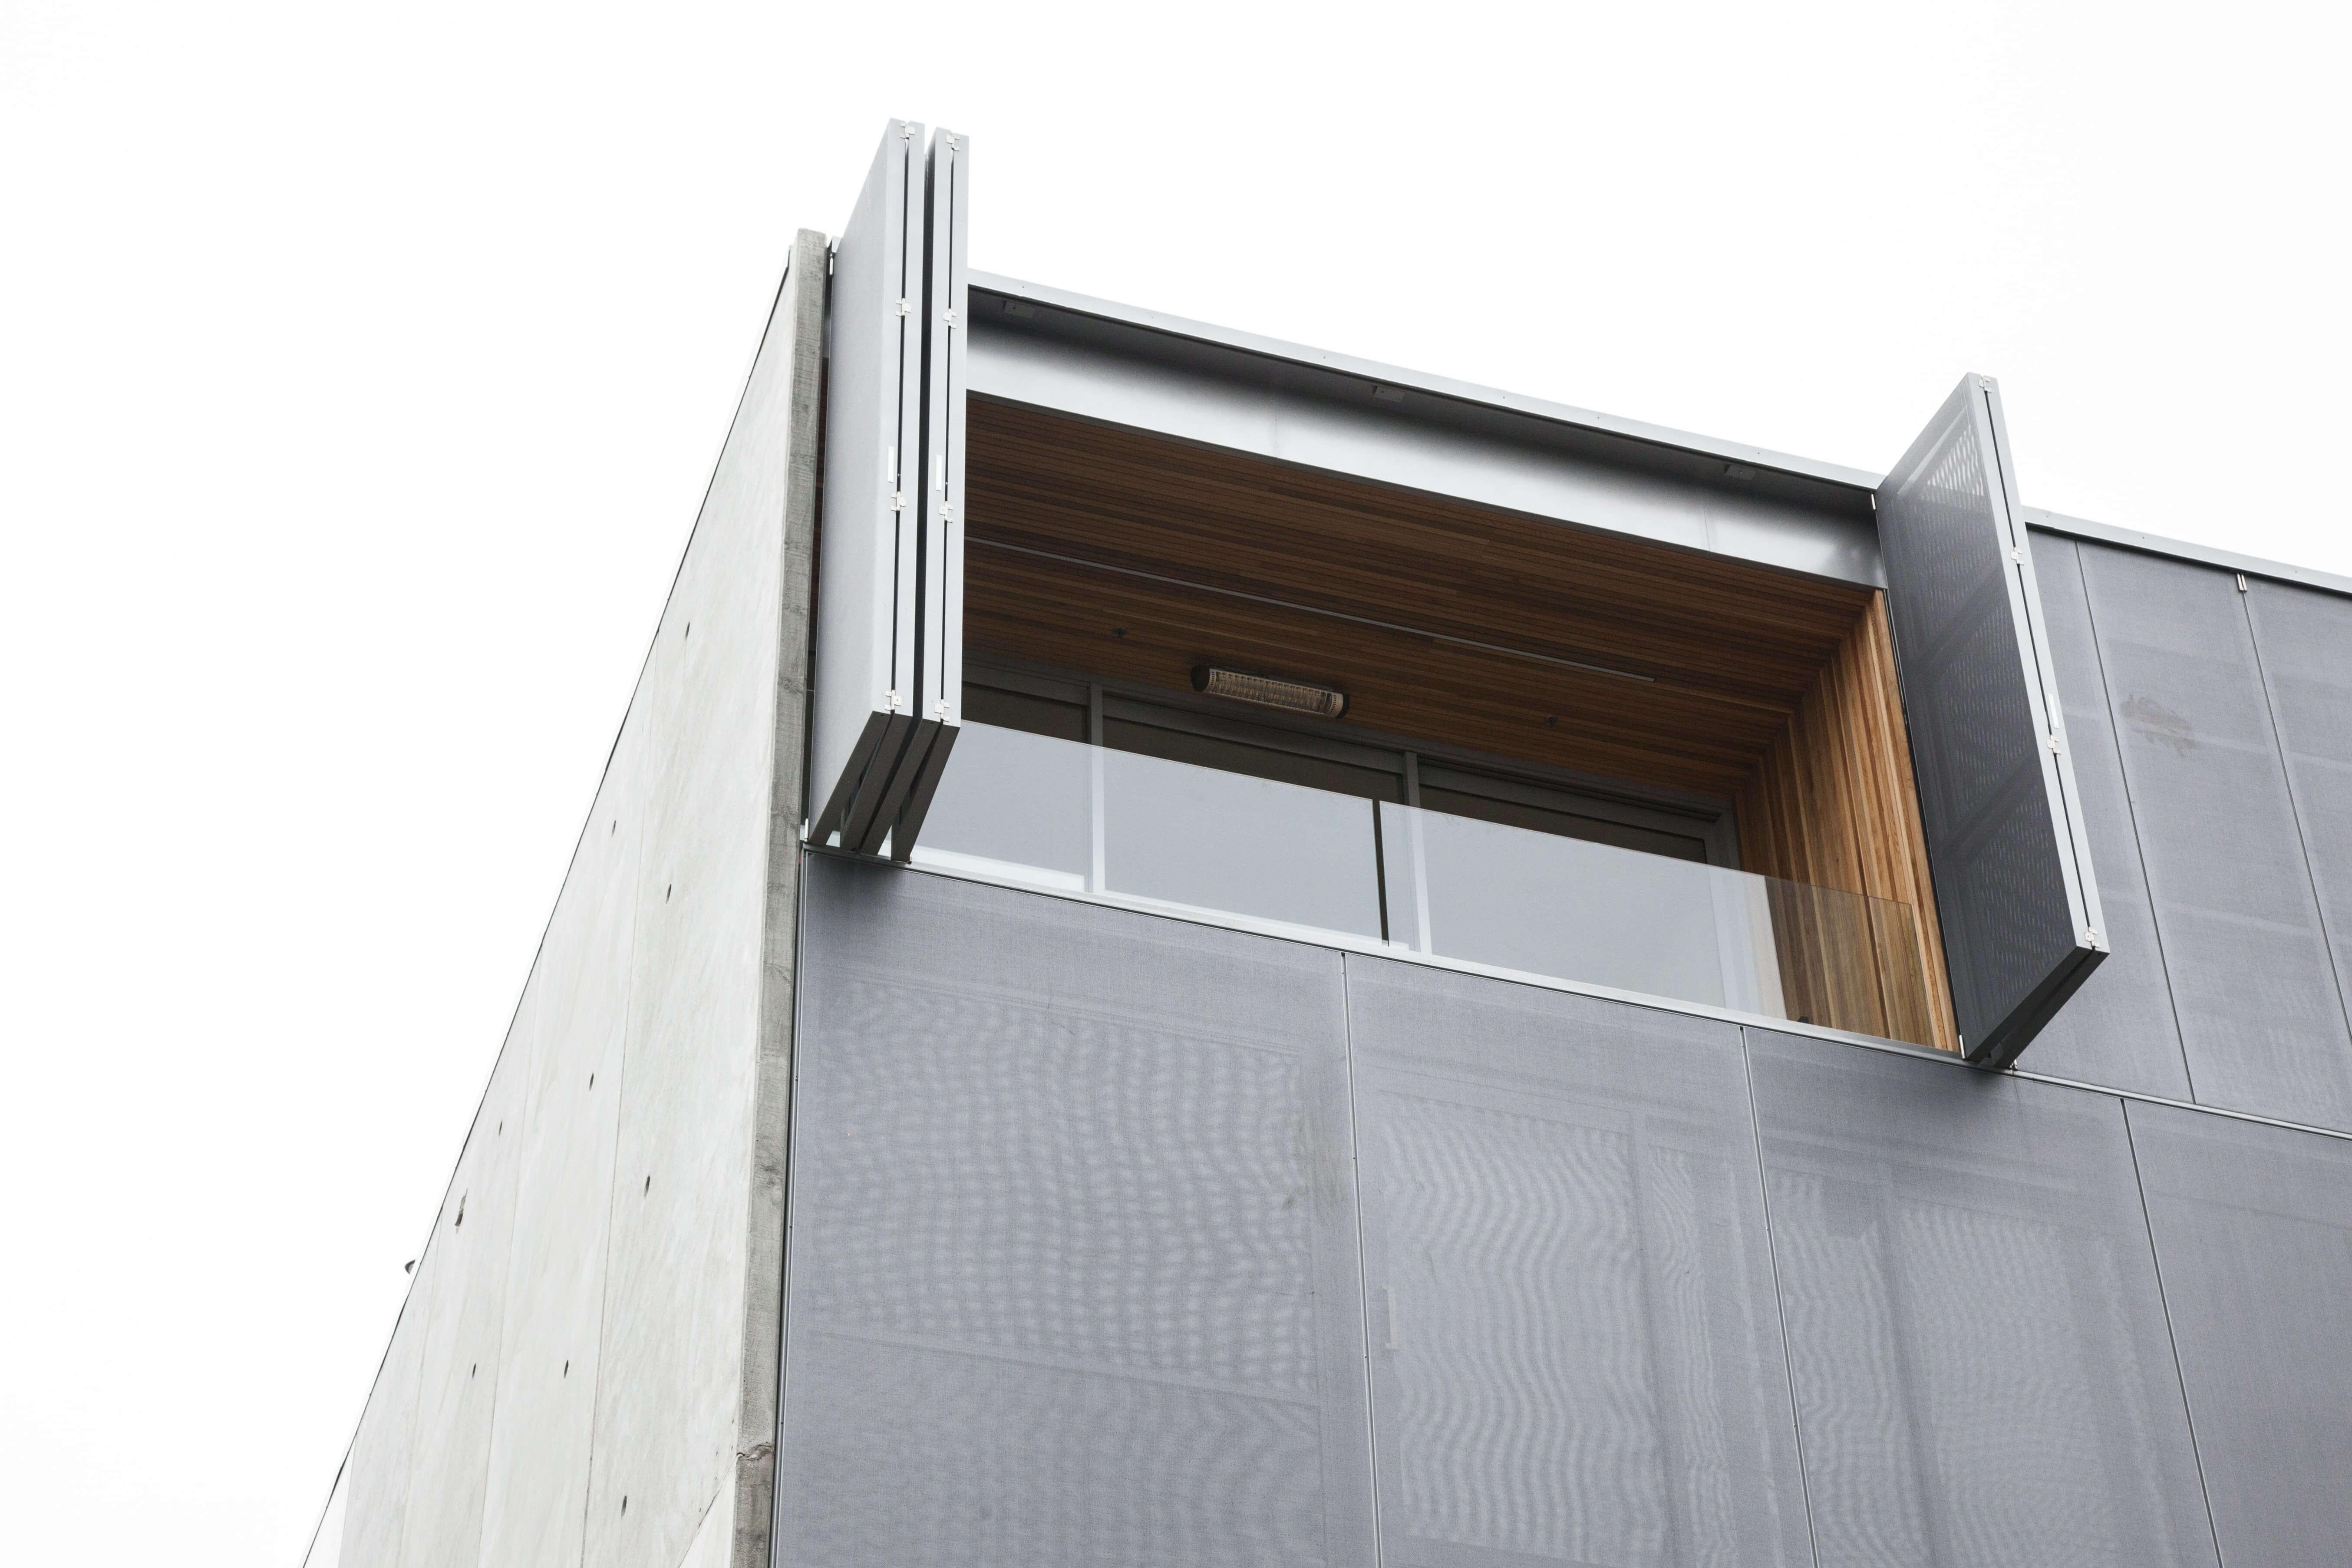 Aurae bi-fold shutters